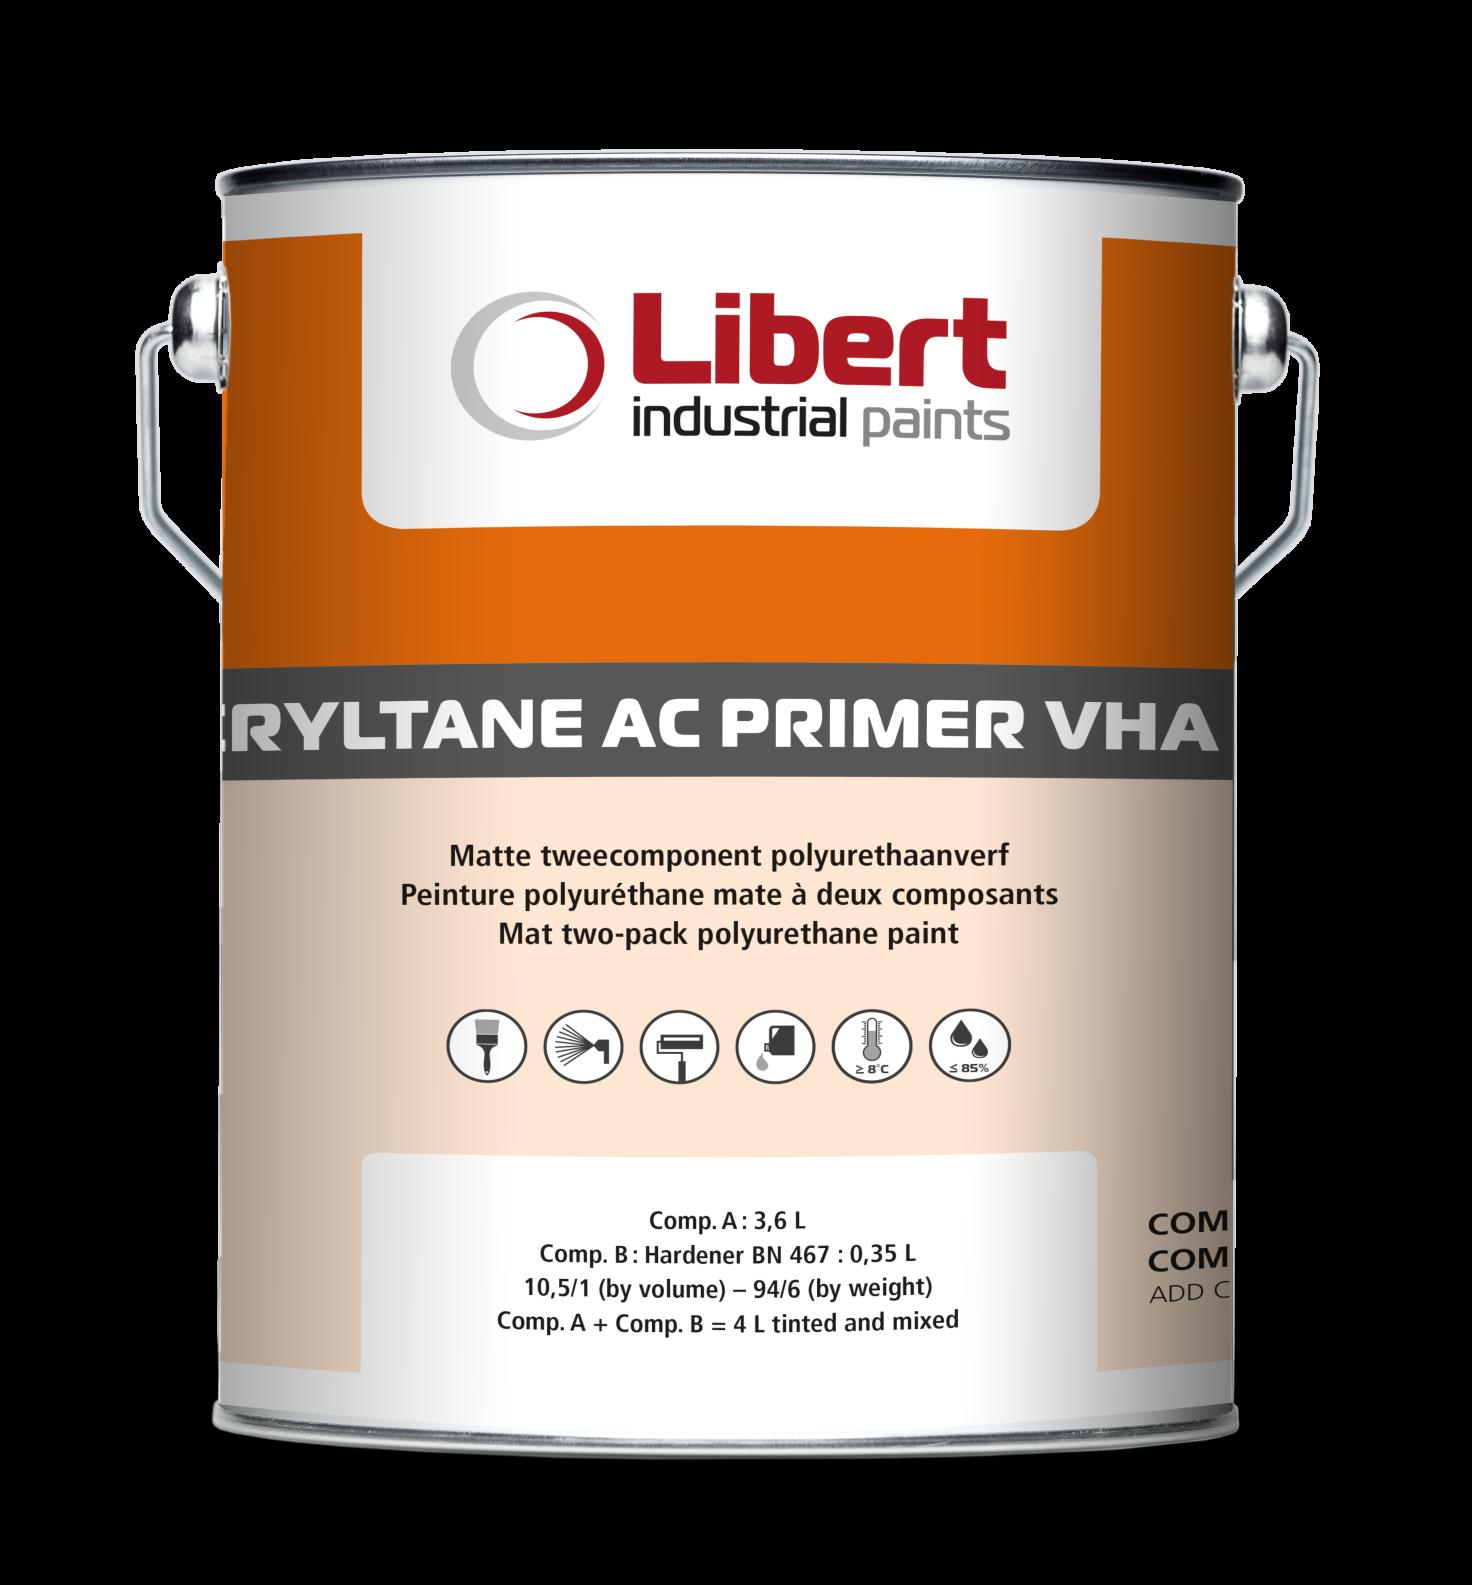 Cryltane AC Primer VHA 006